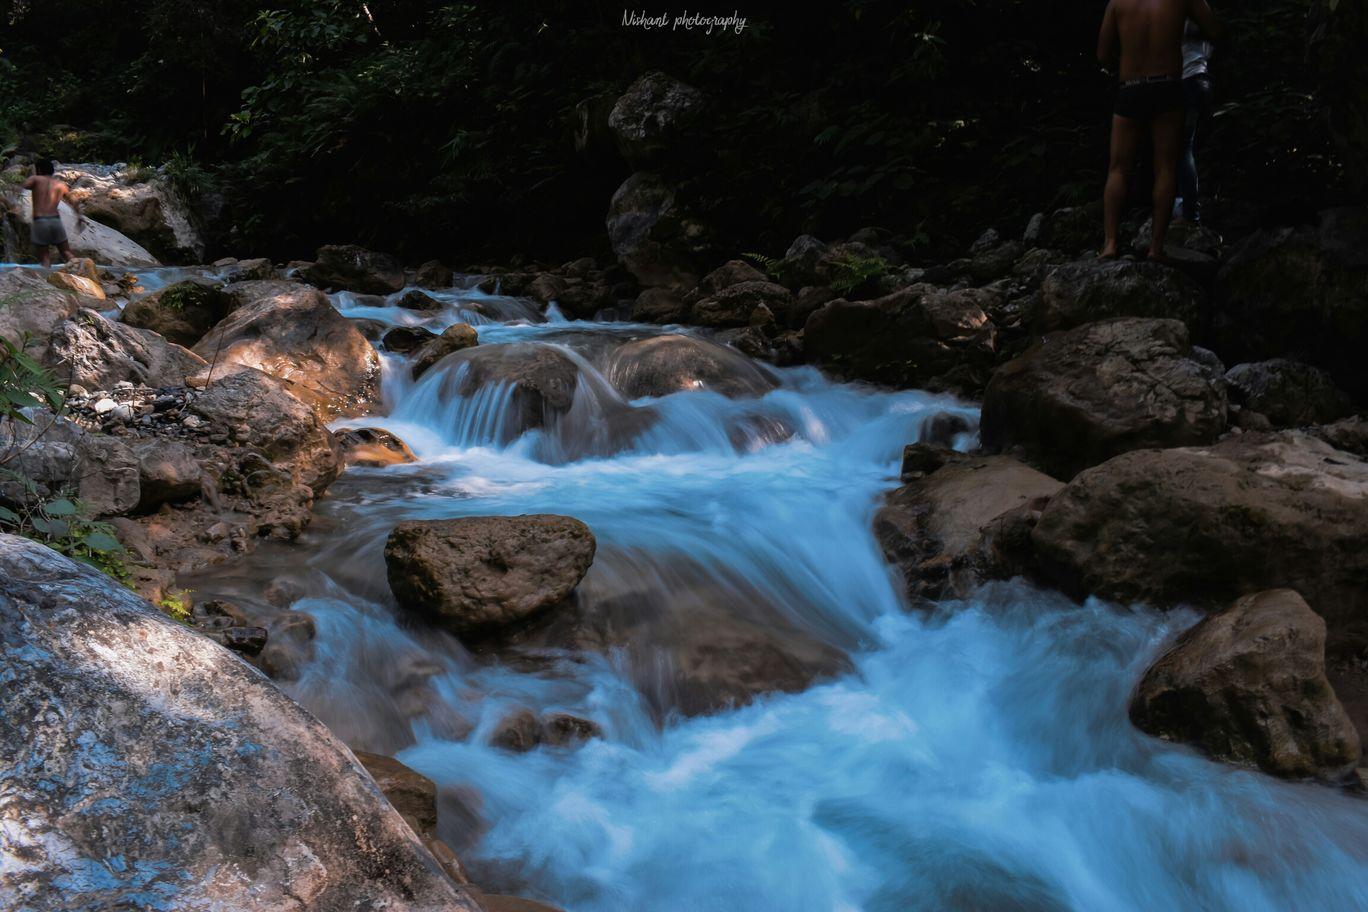 Photo of Rishikesh River Rafting & Camping By Nishant Tripathi